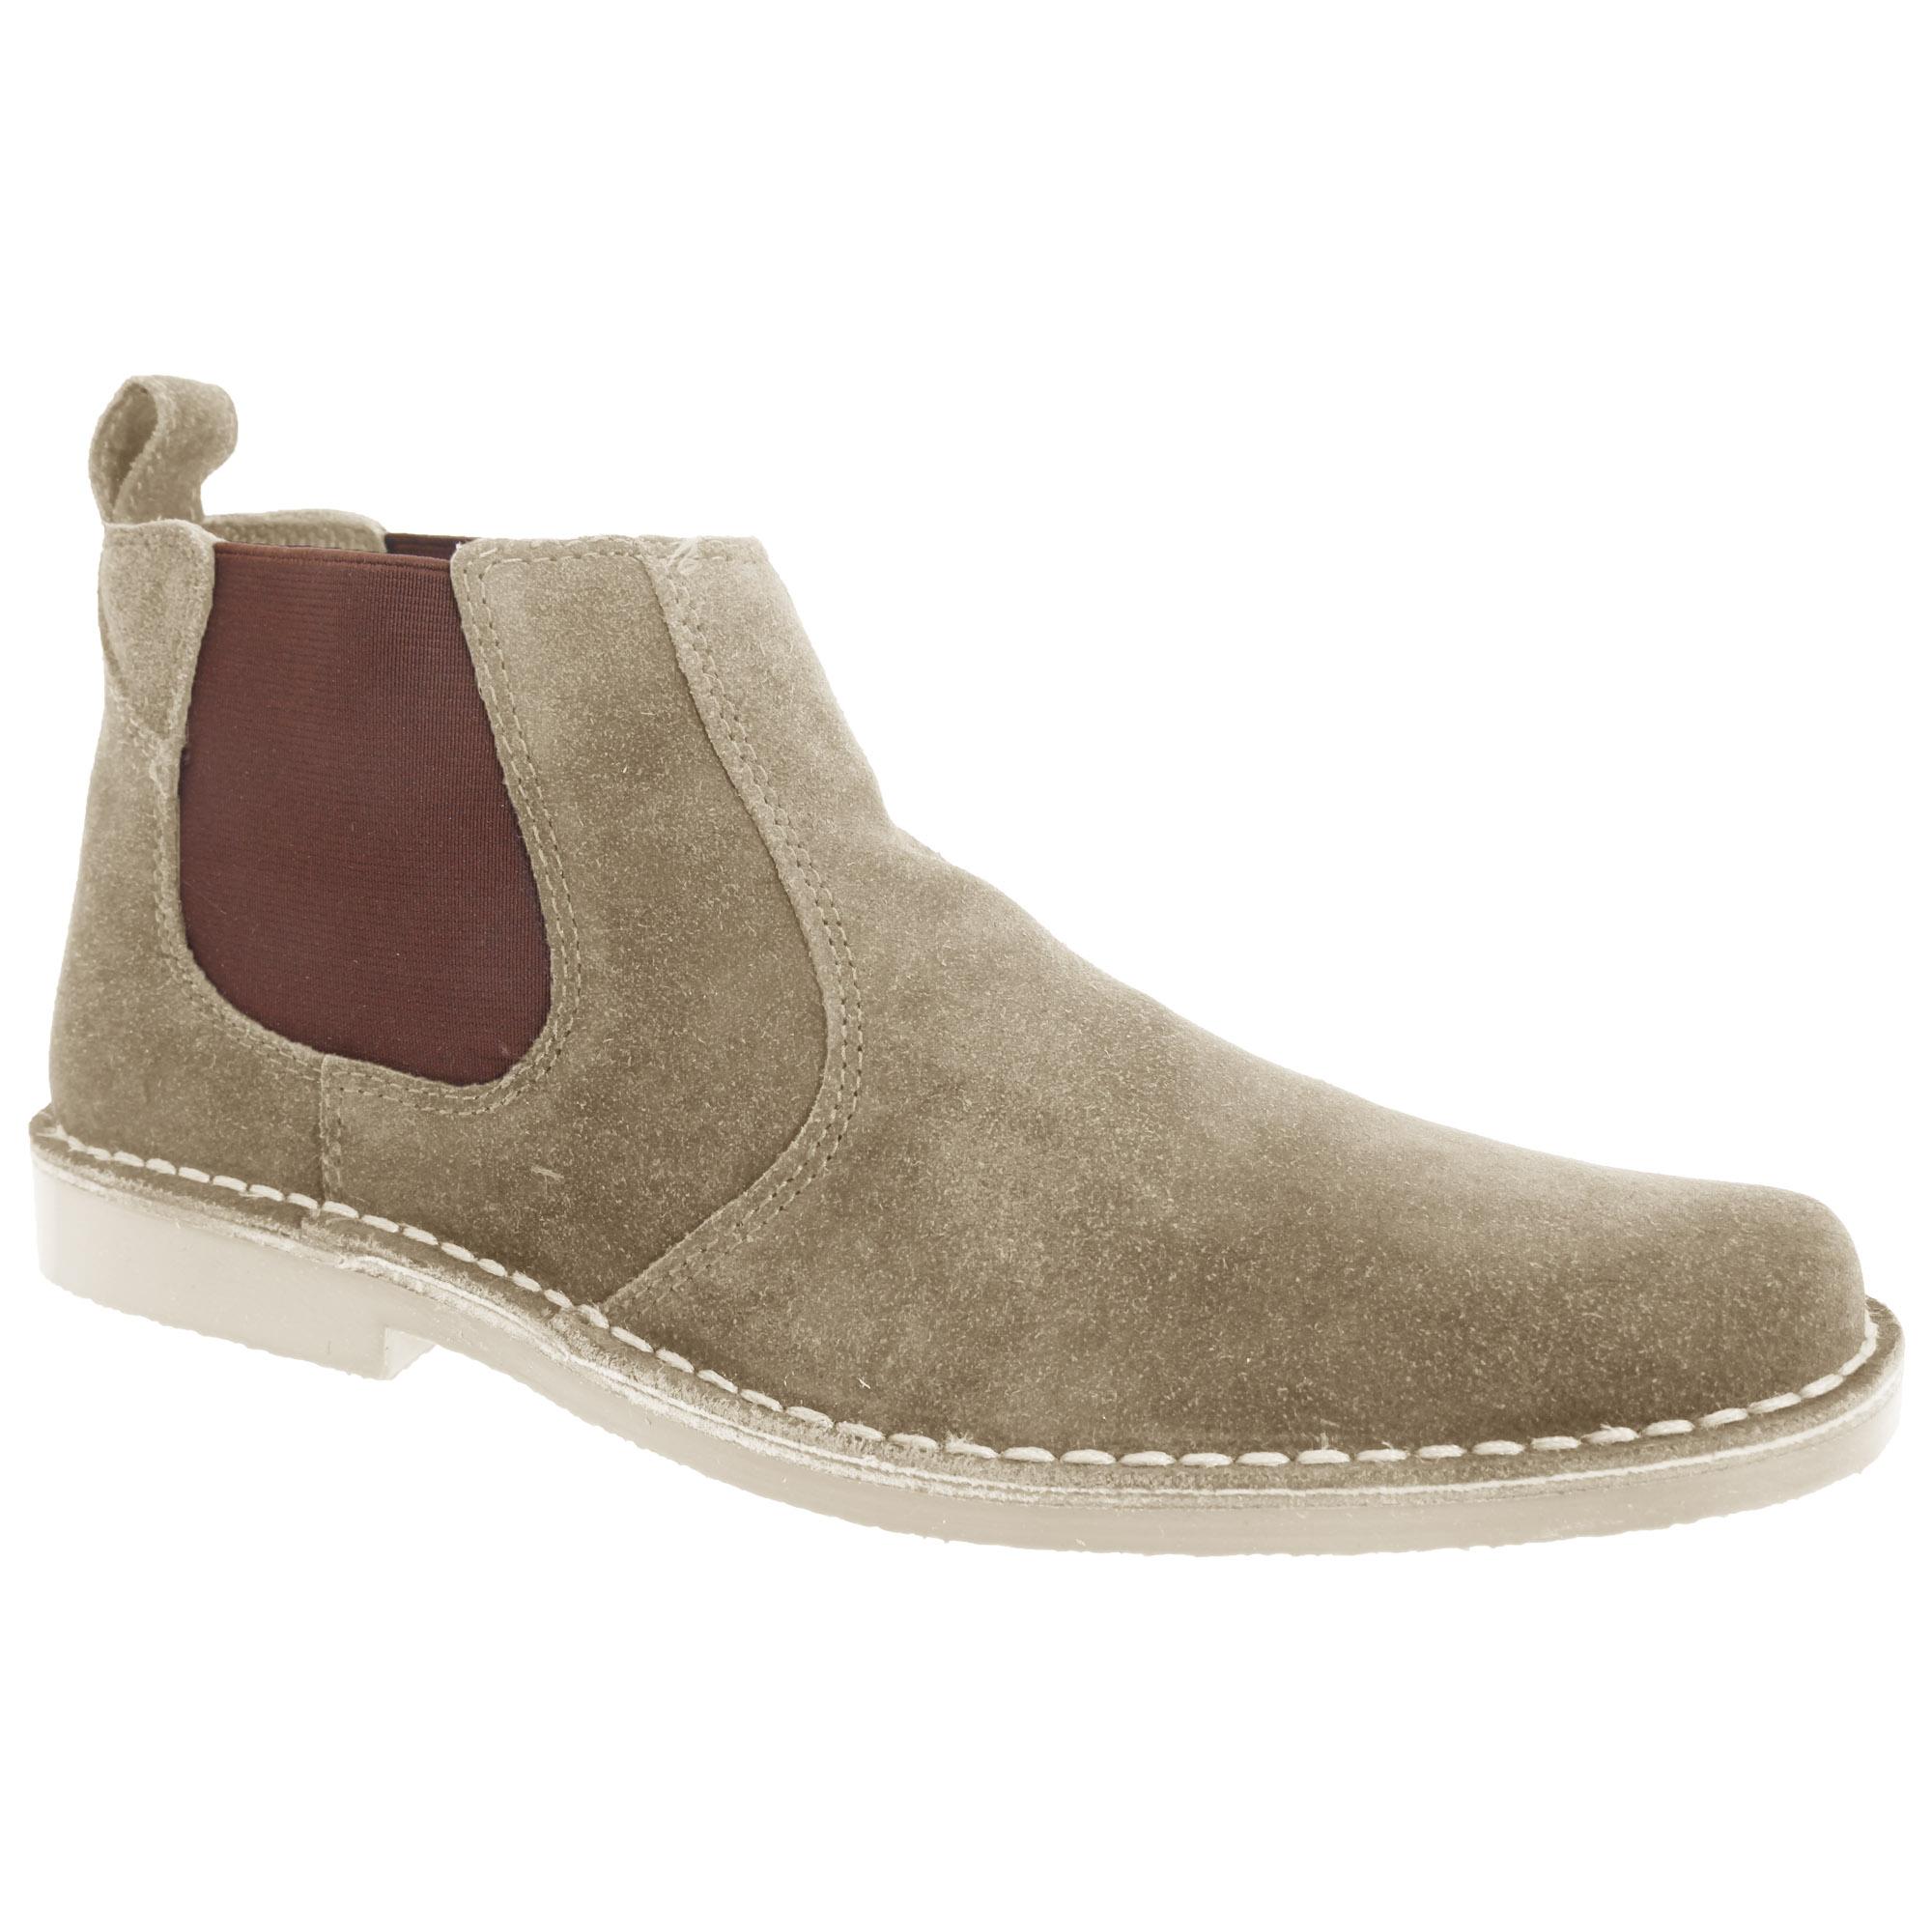 Roamers Mens Real Suede Classic Desert Boots (8 UK) (Dark Brown)